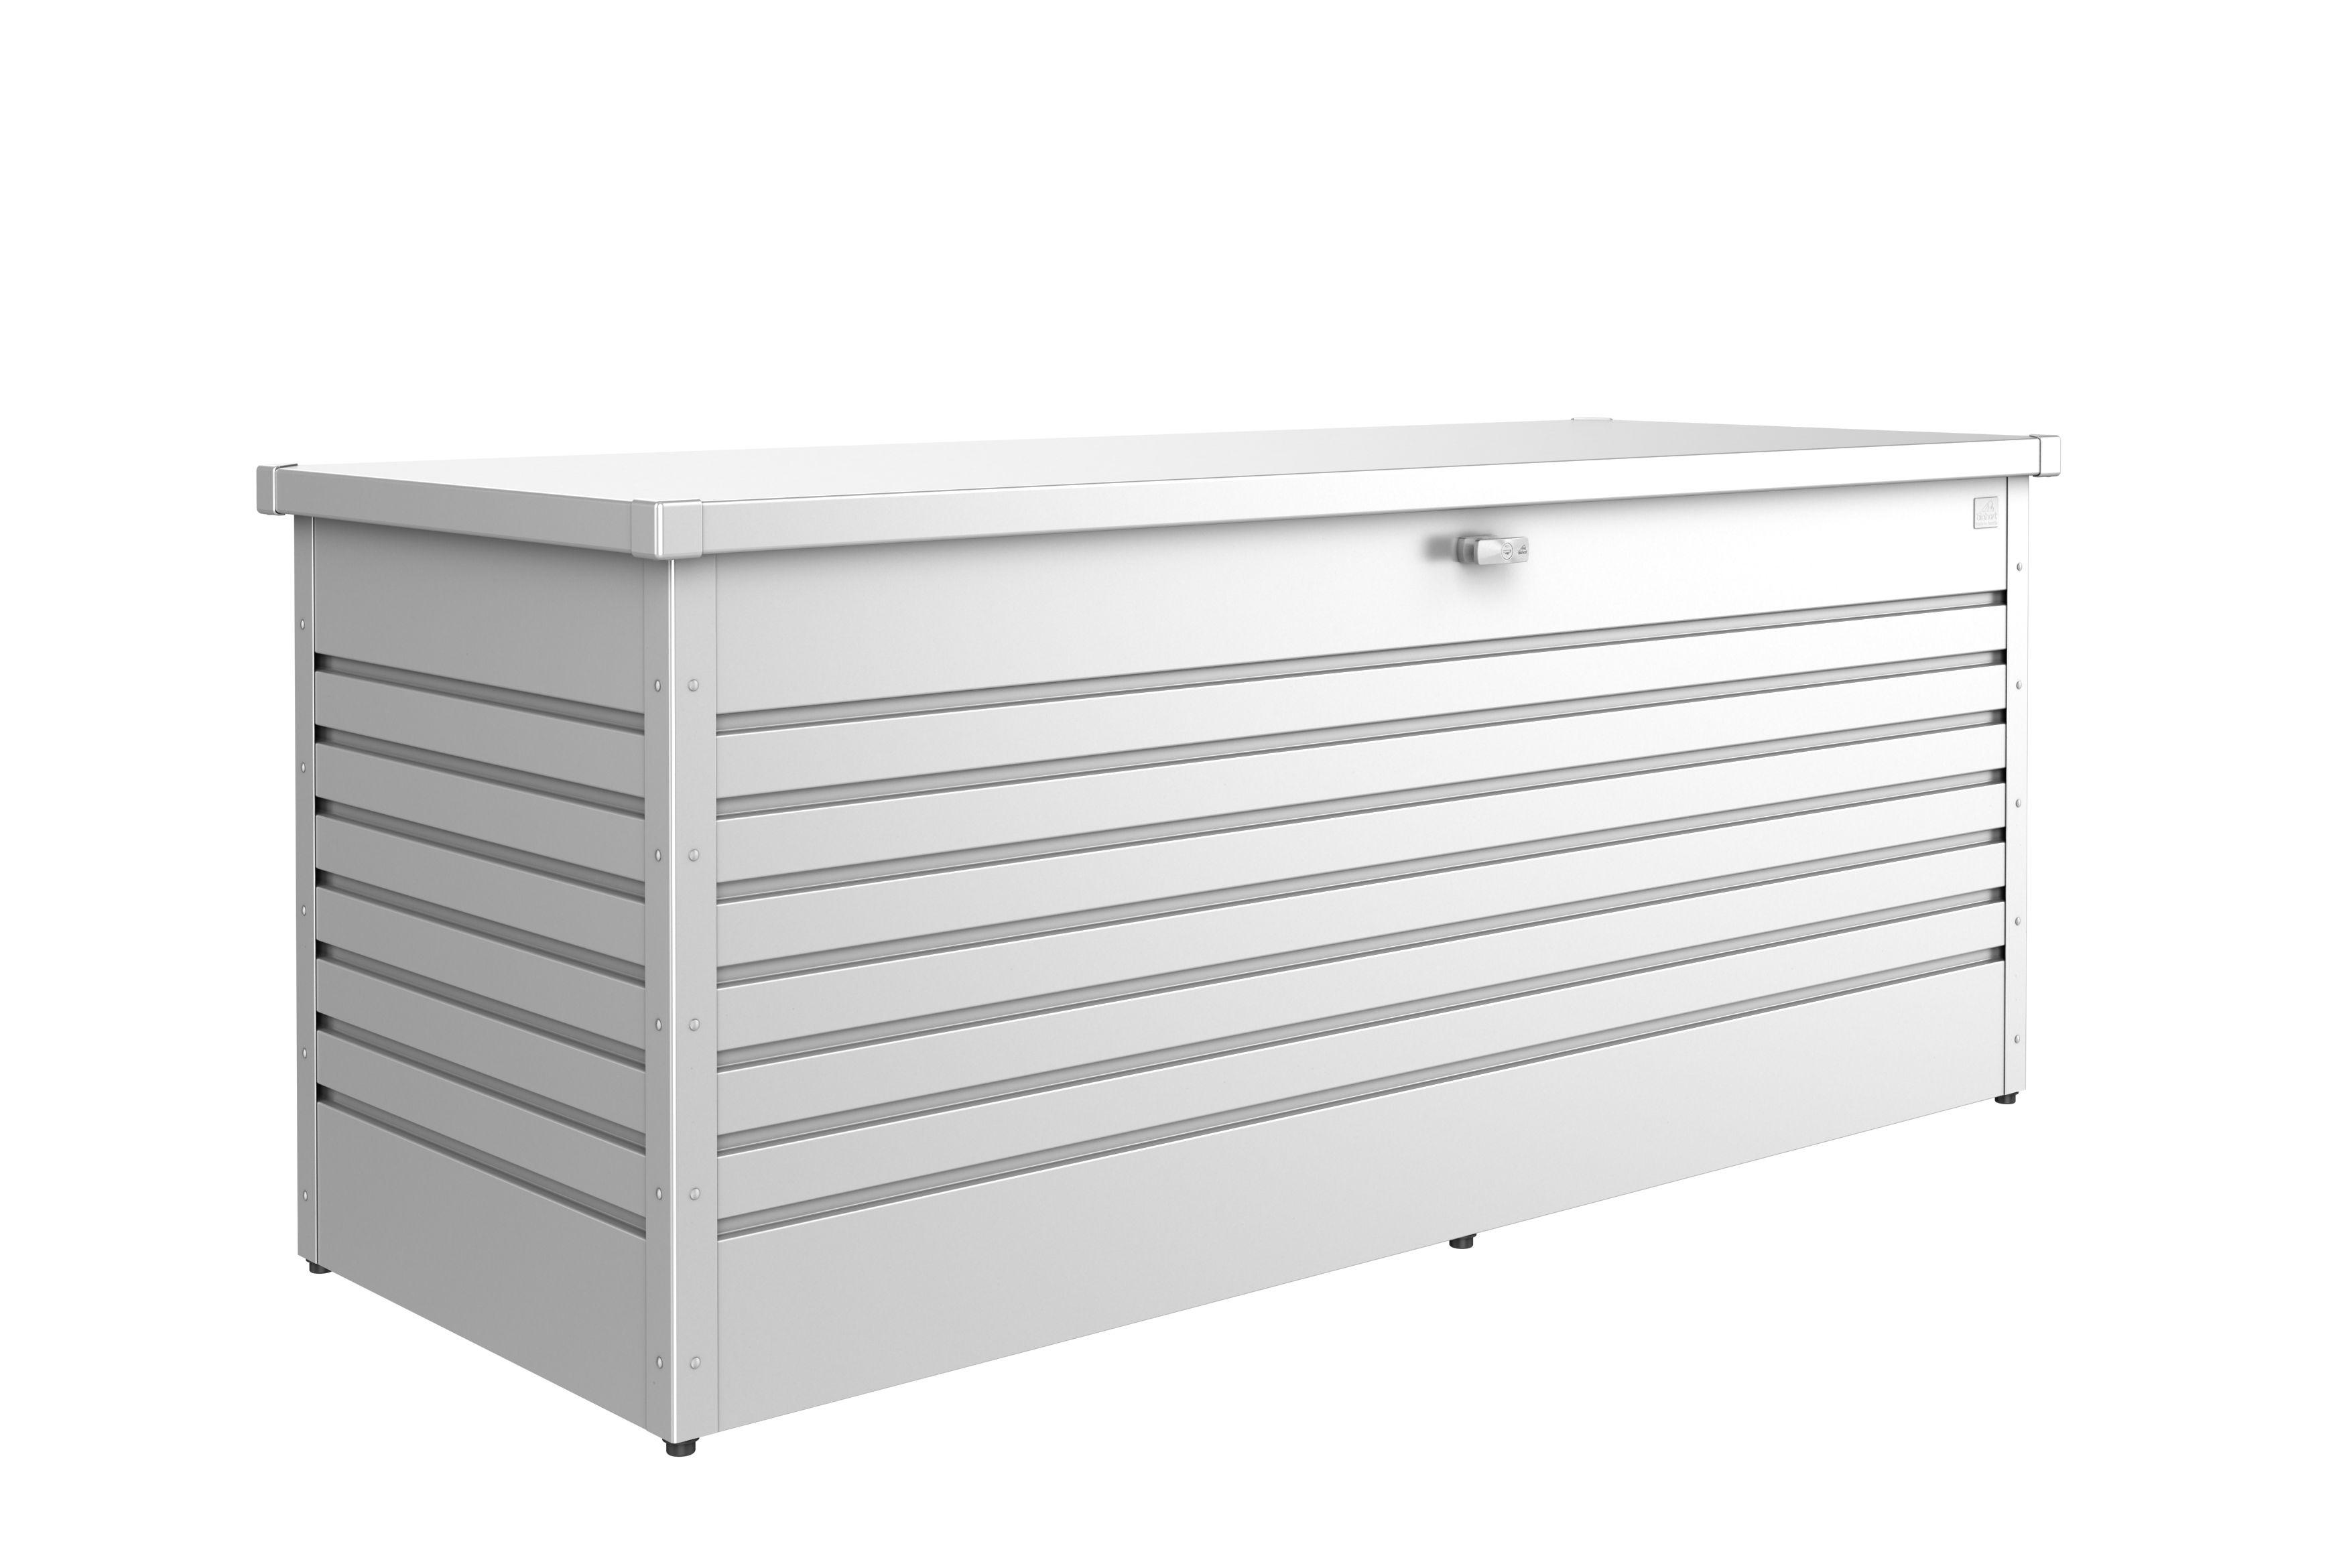 Biohort Úložný box FreizeitBox 200, stříbrná metalíza